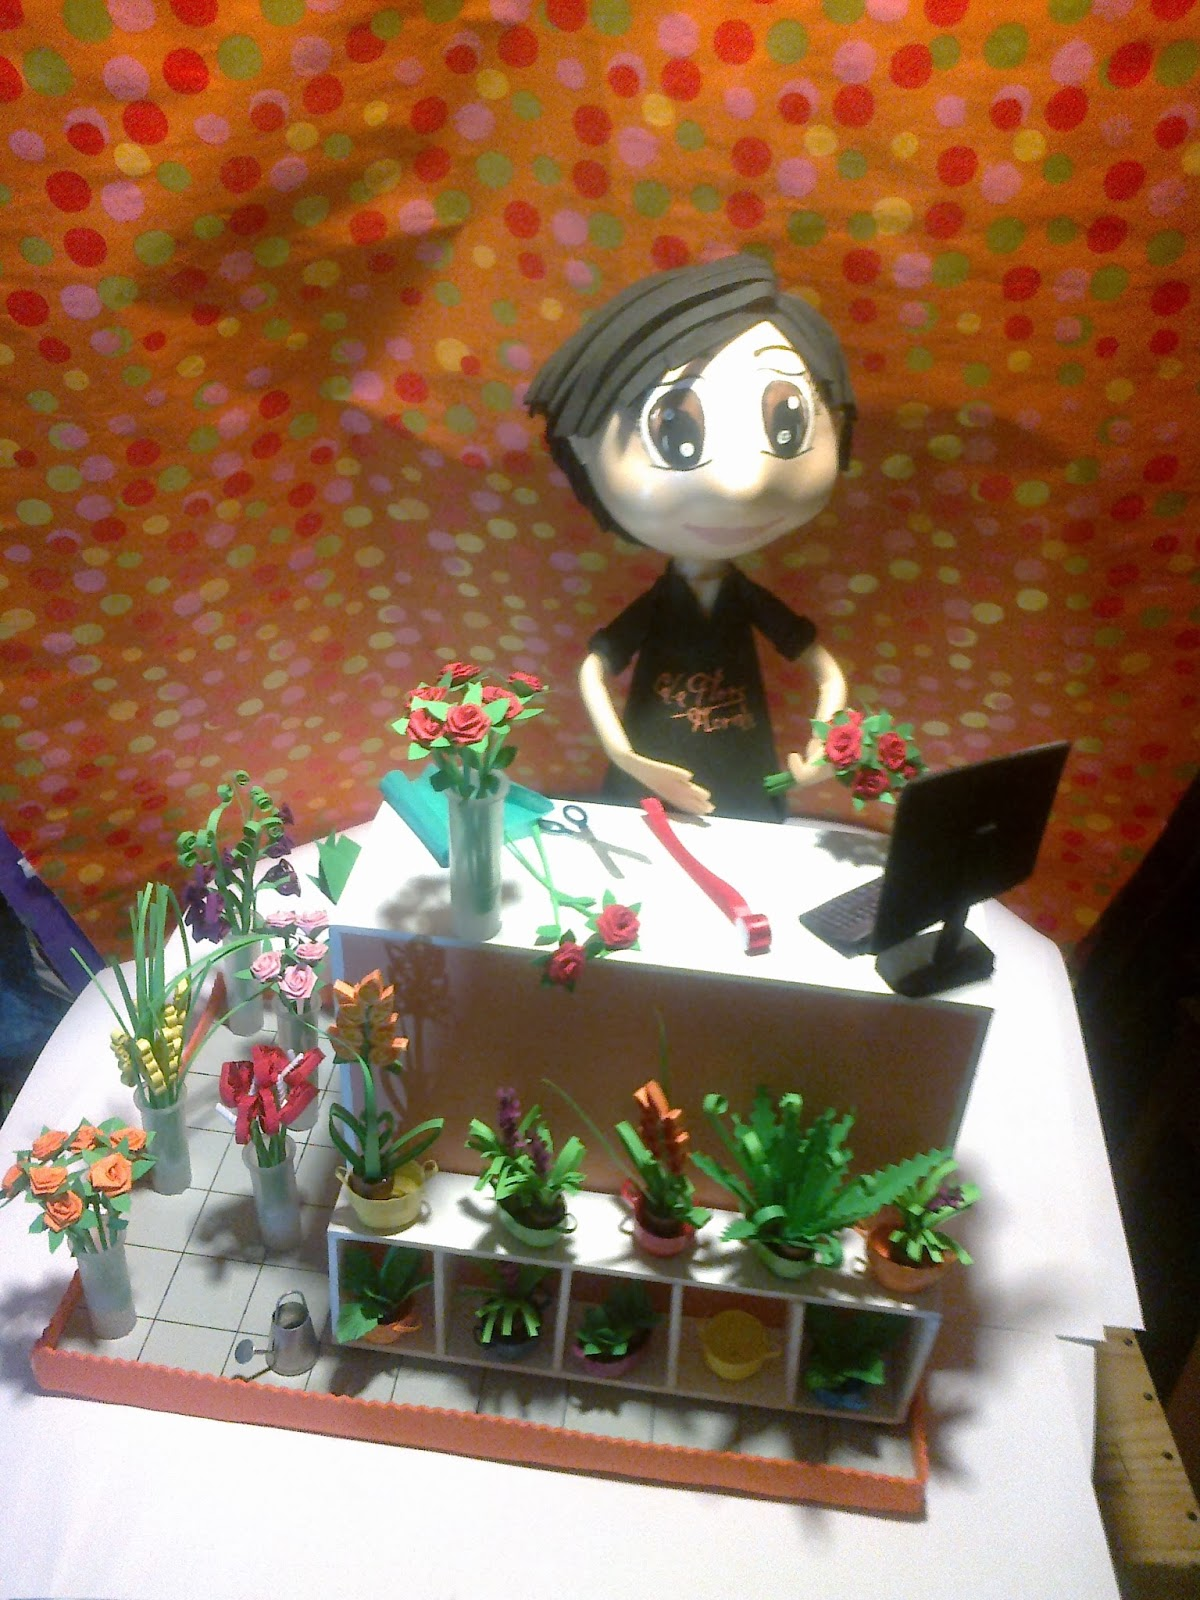 http://caticreaciones.blogspot.com/2013/11/fofucha-florista.html